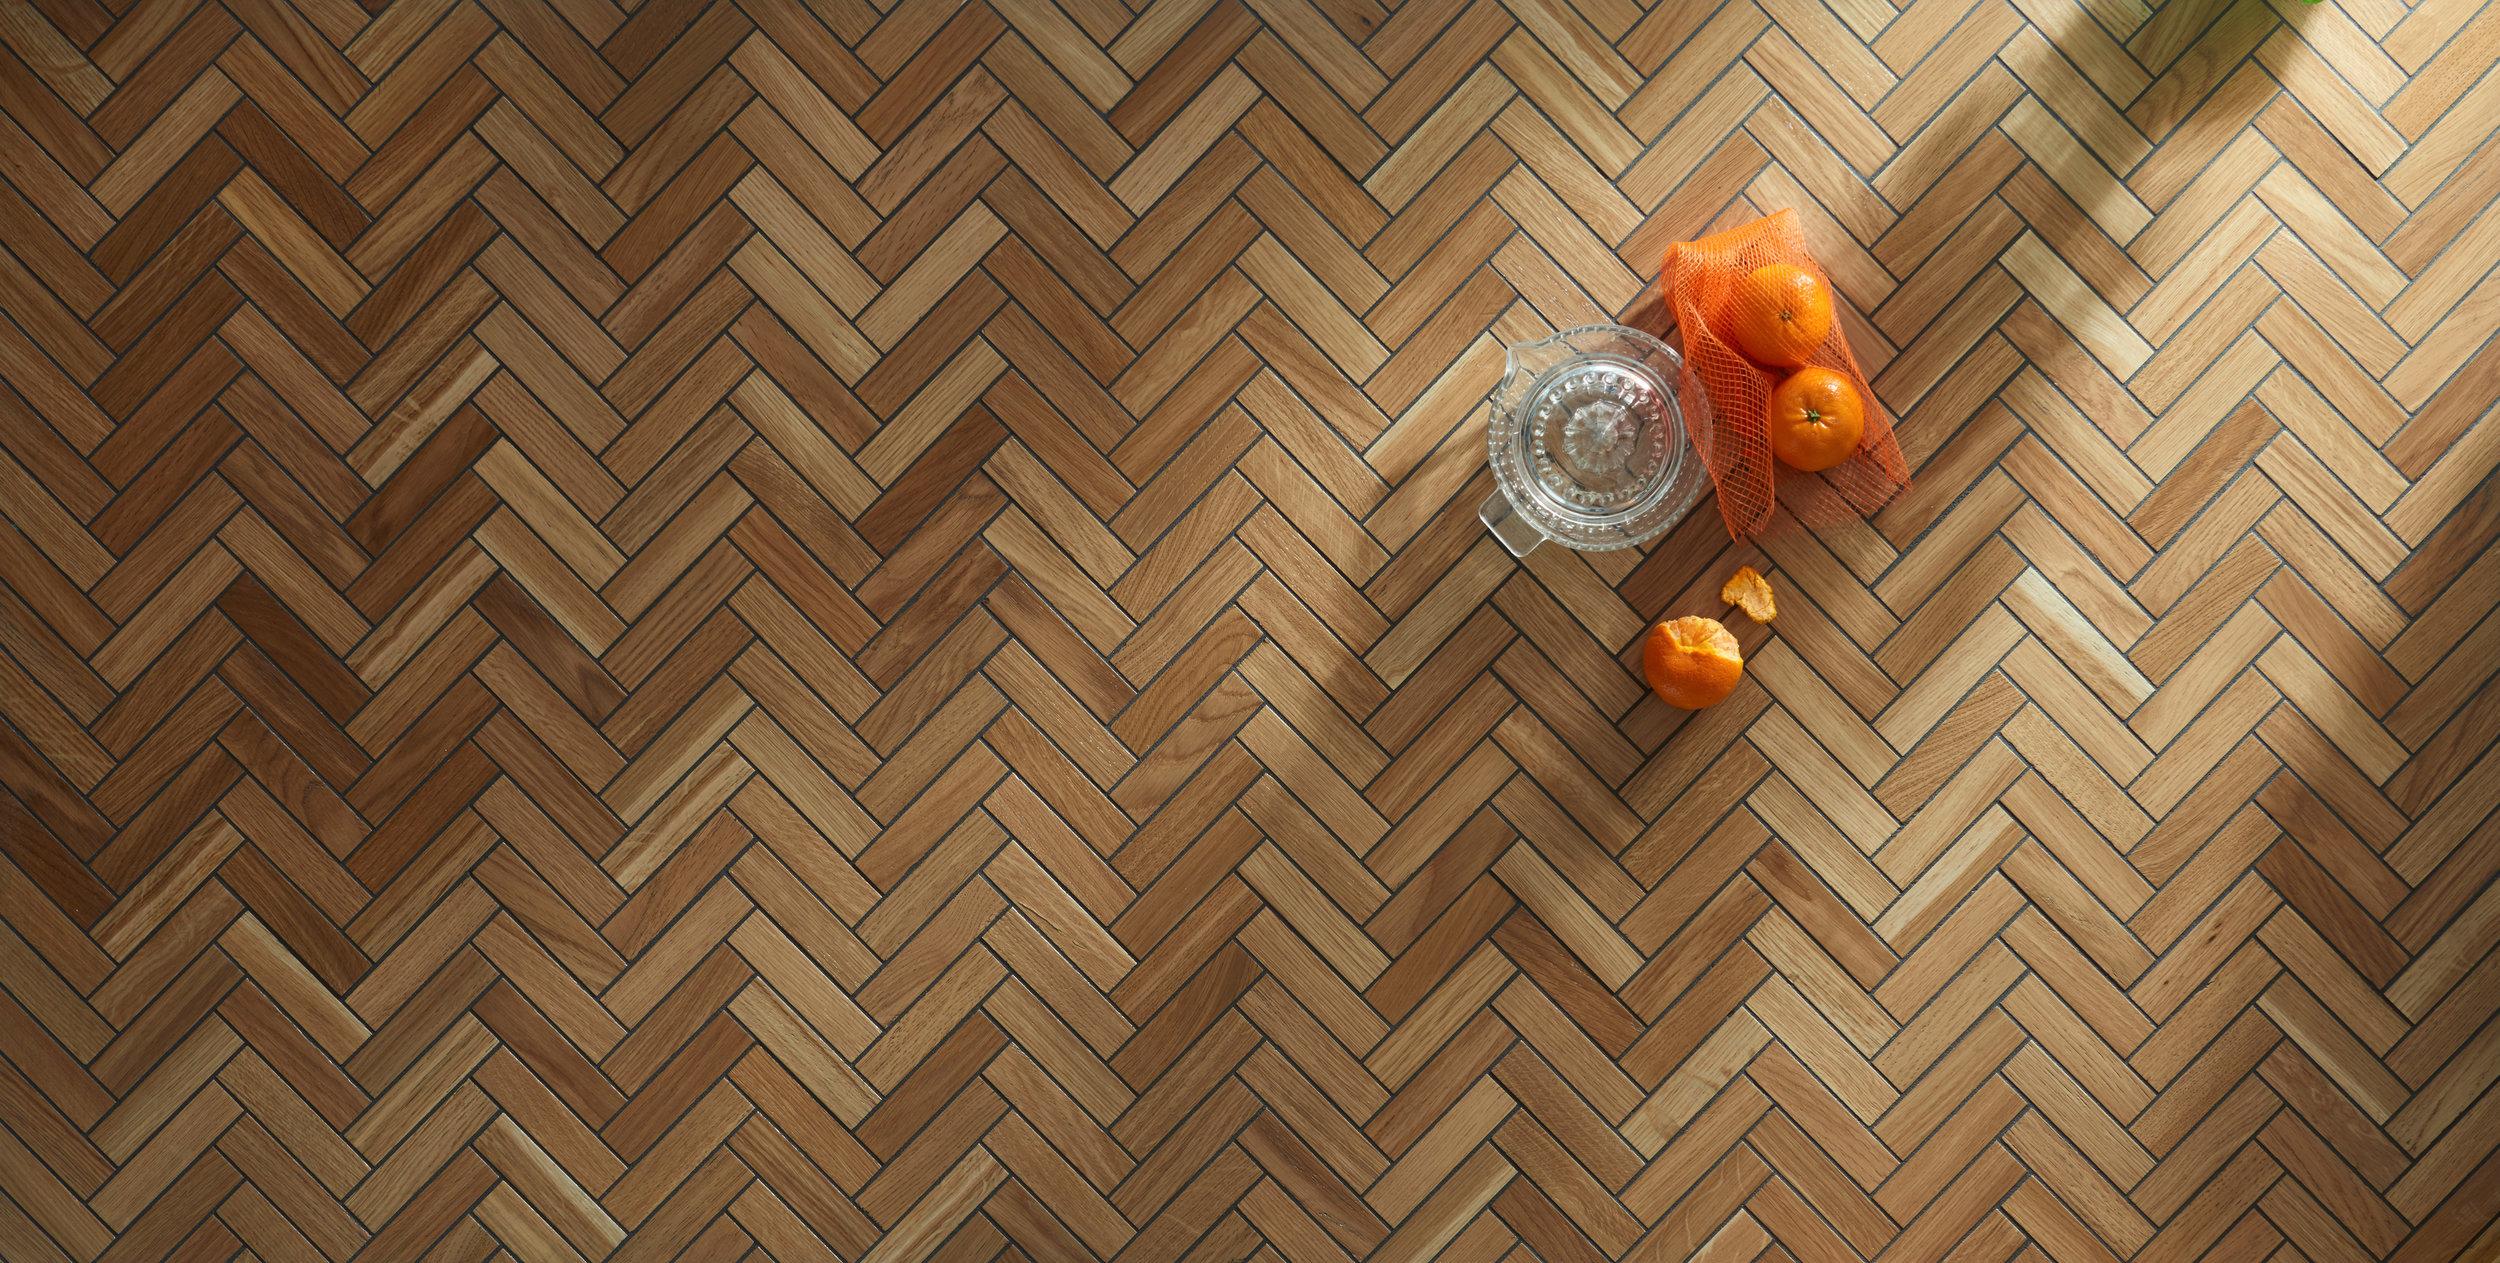 Another-Brand-Mosaico-Harringbone-Oak-Wood-Tiles-Kitchen-05.jpg